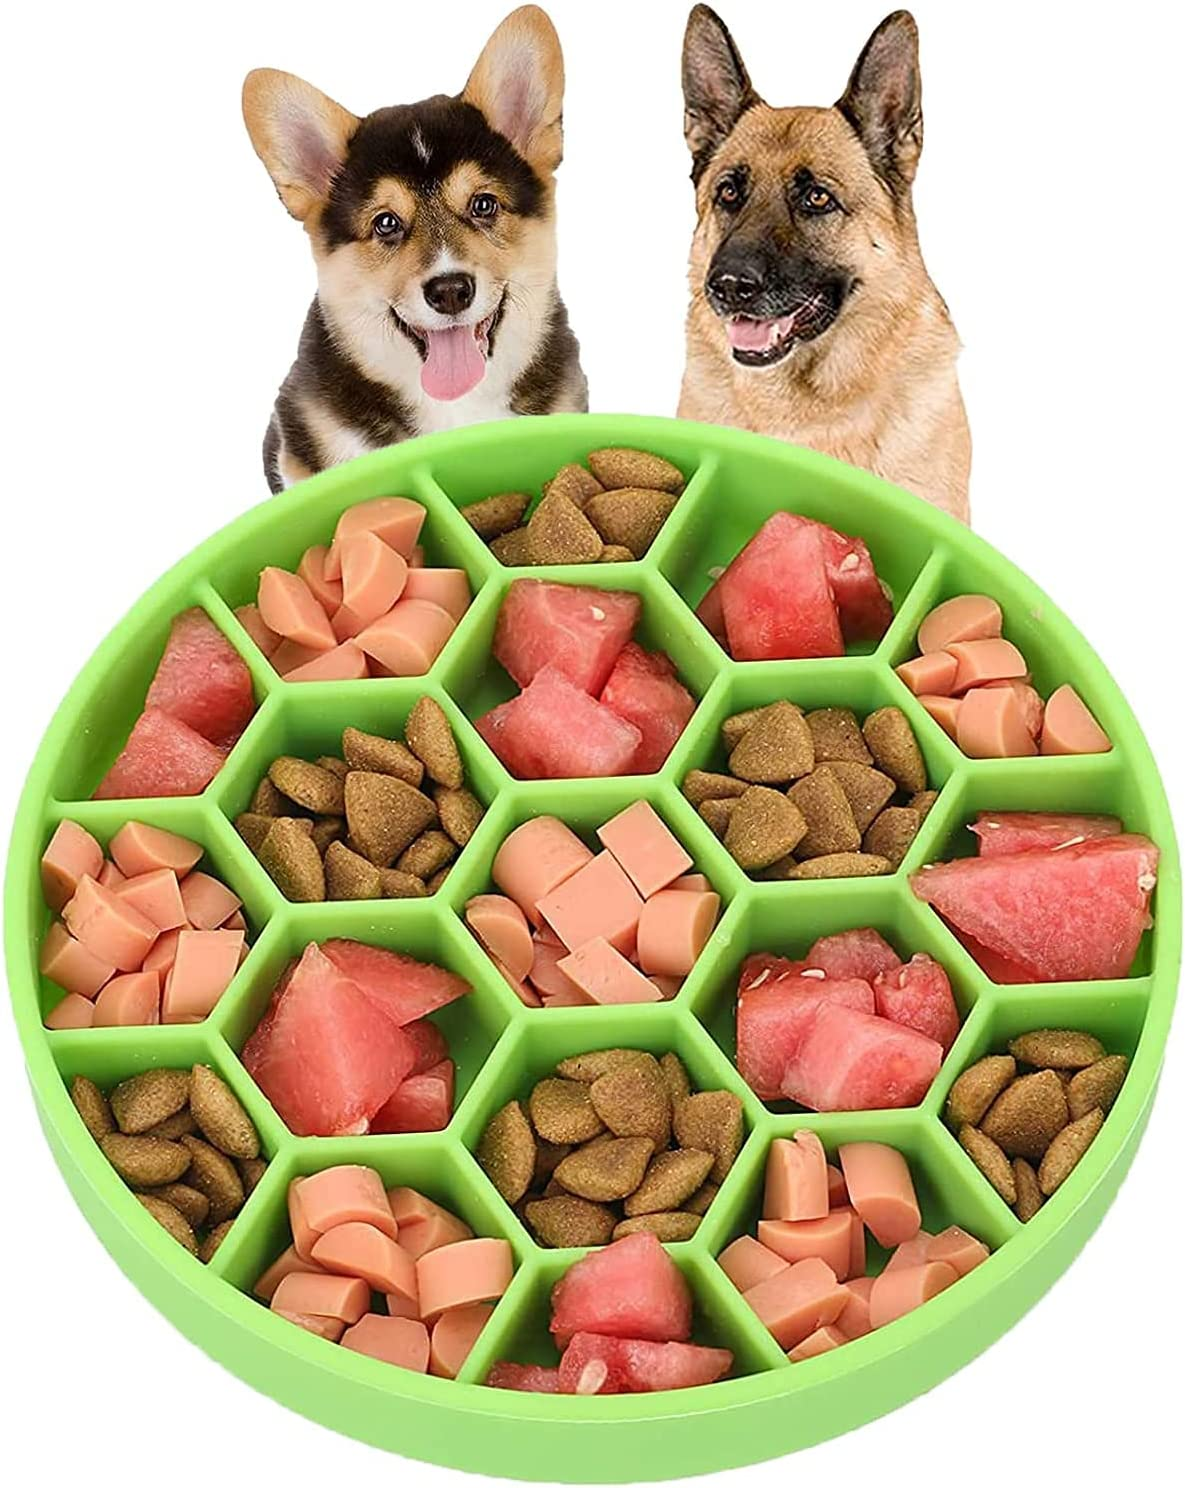 PEVHSVZ Pet Slow Feeder Bowl Super sale Financial sales sale Dogs Anti-Choke Anti-Slip for